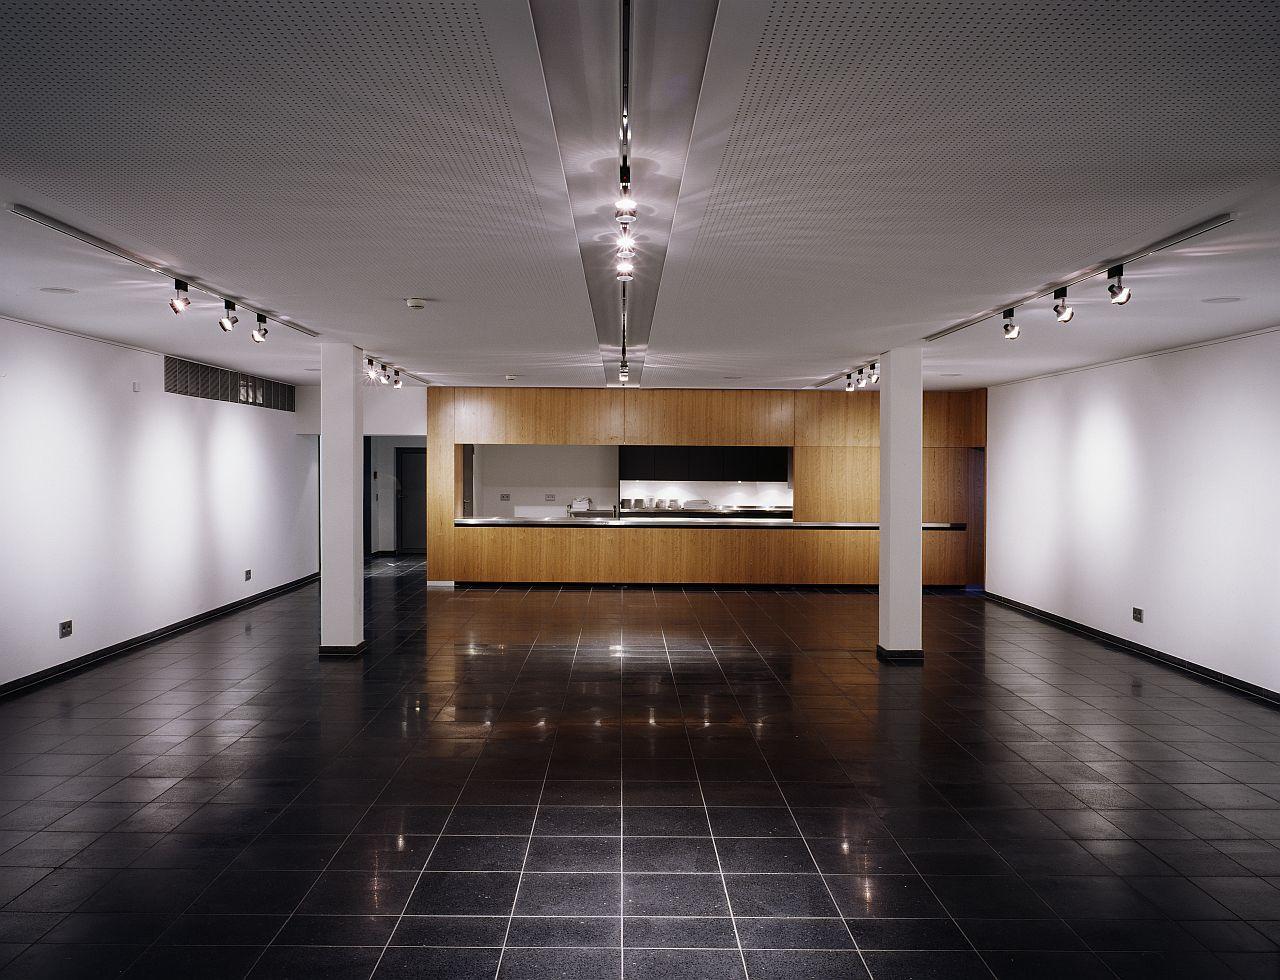 Festhalle Unteres Foyer